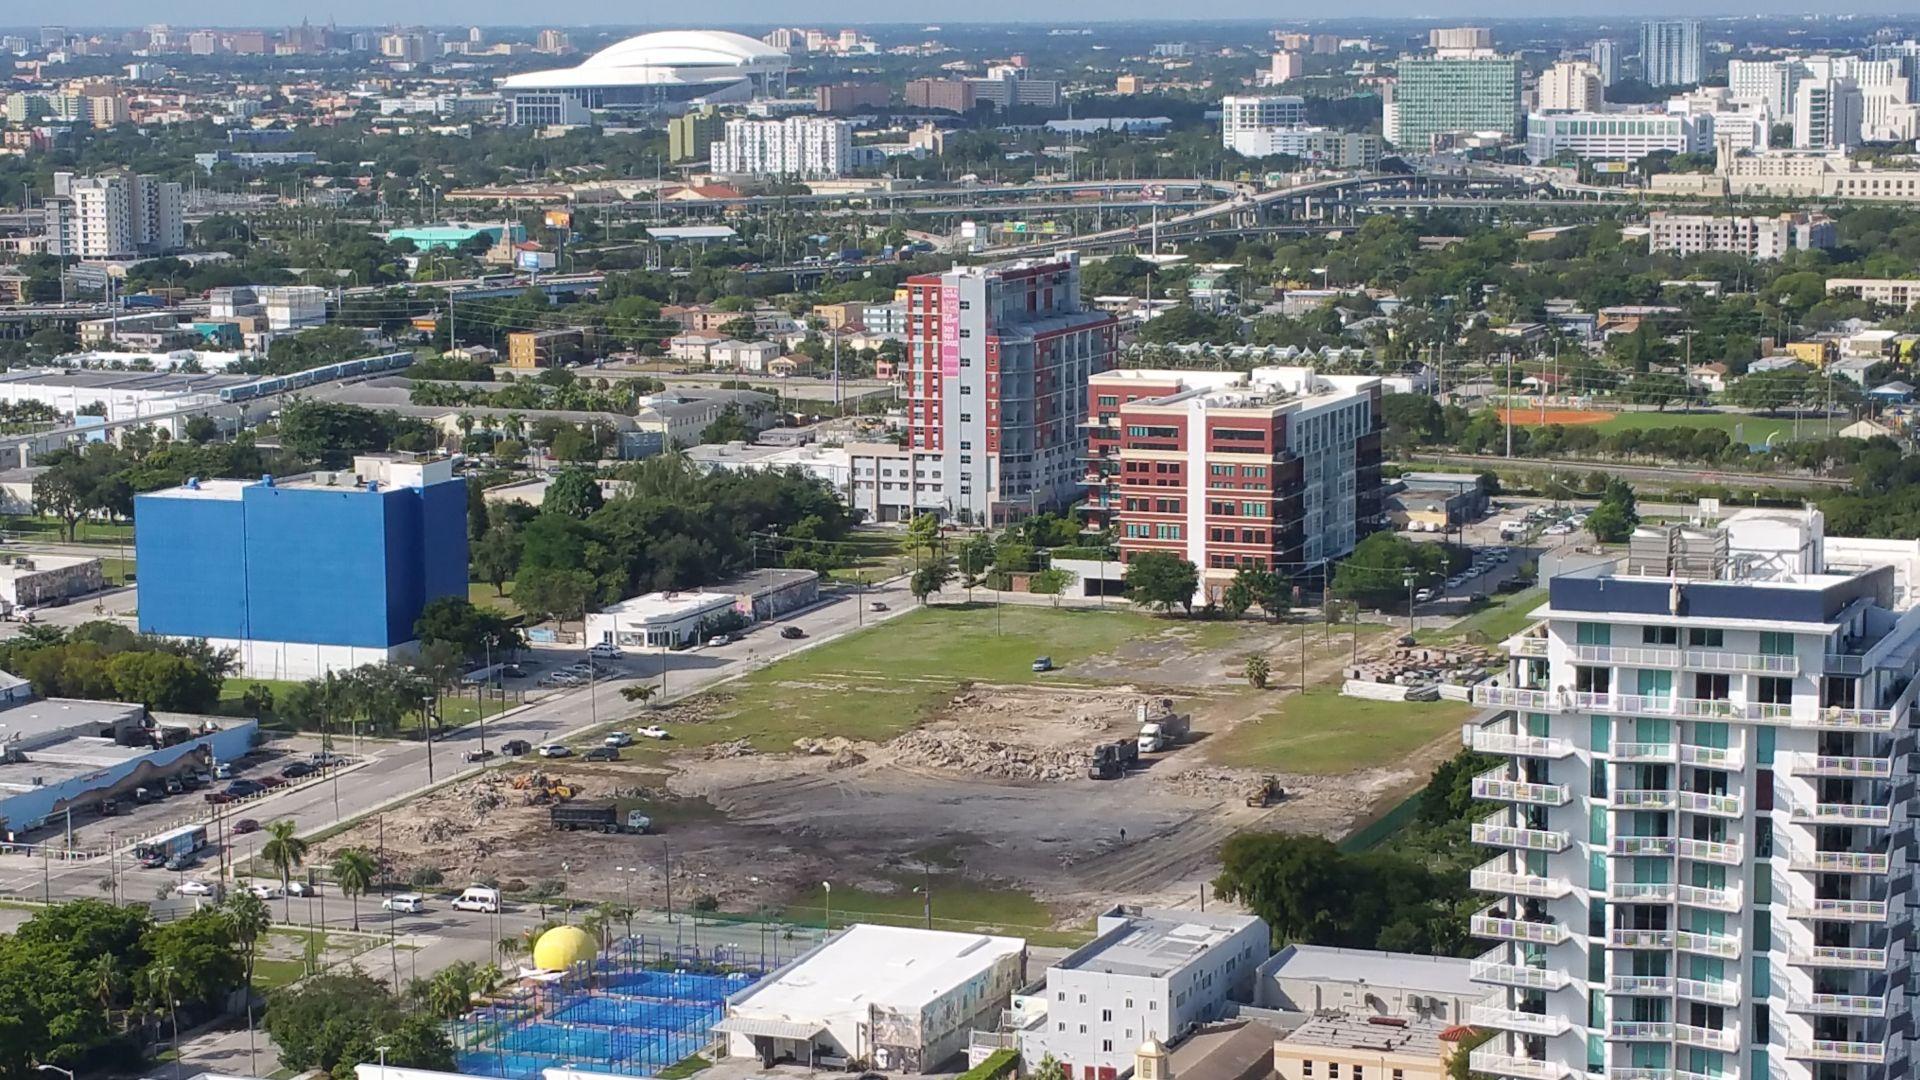 Vib Miami breaking ground this month